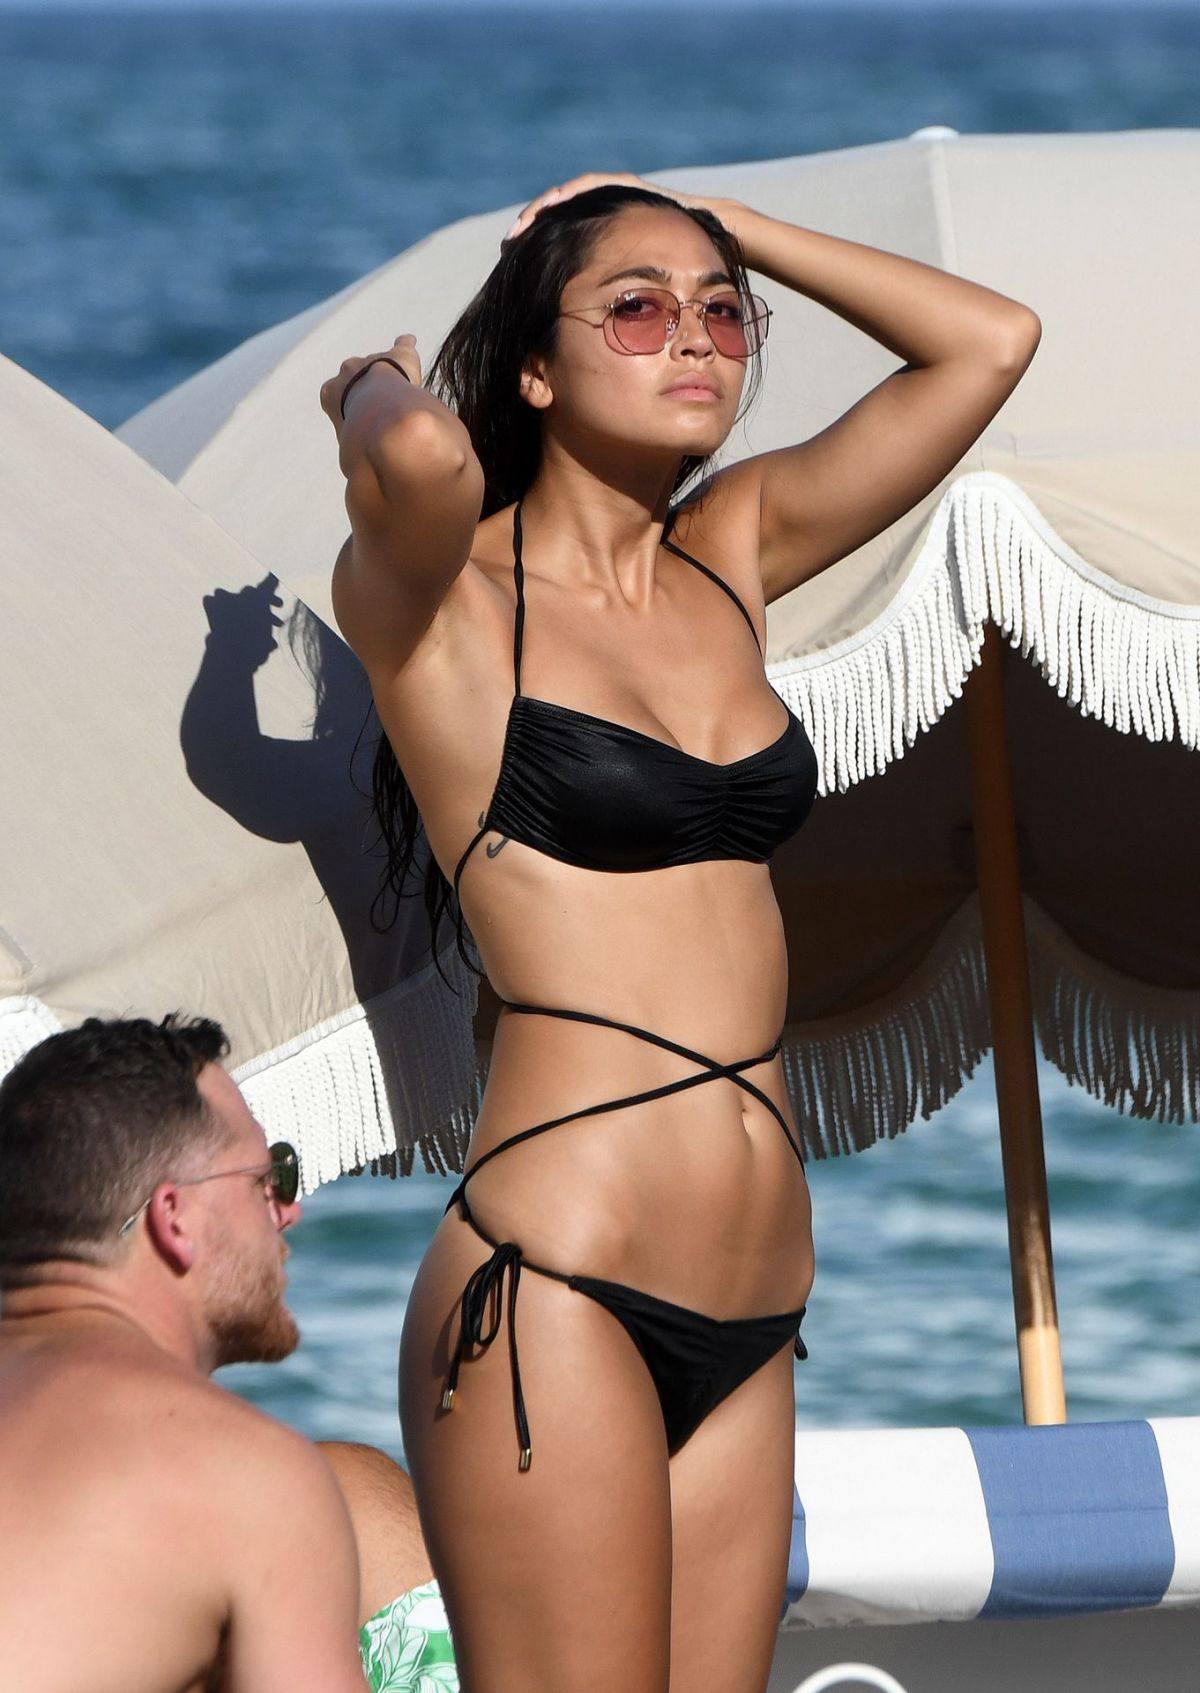 Ambra Gutierrez – Beautiful Body In Small Bikini At The Beach In Miami Beach 0009